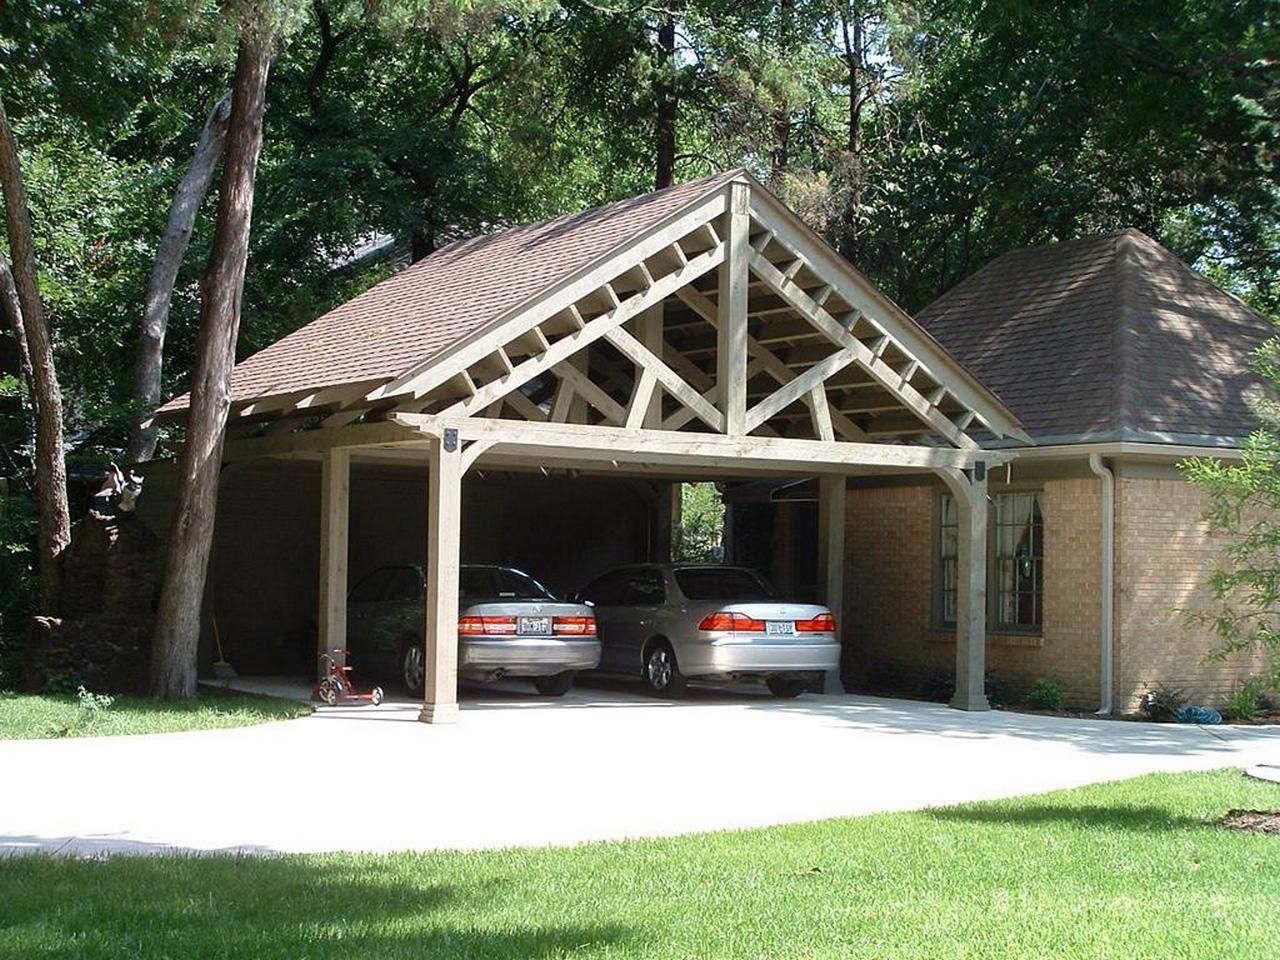 Building a Carport-carports-metal sheds-aluminum carport